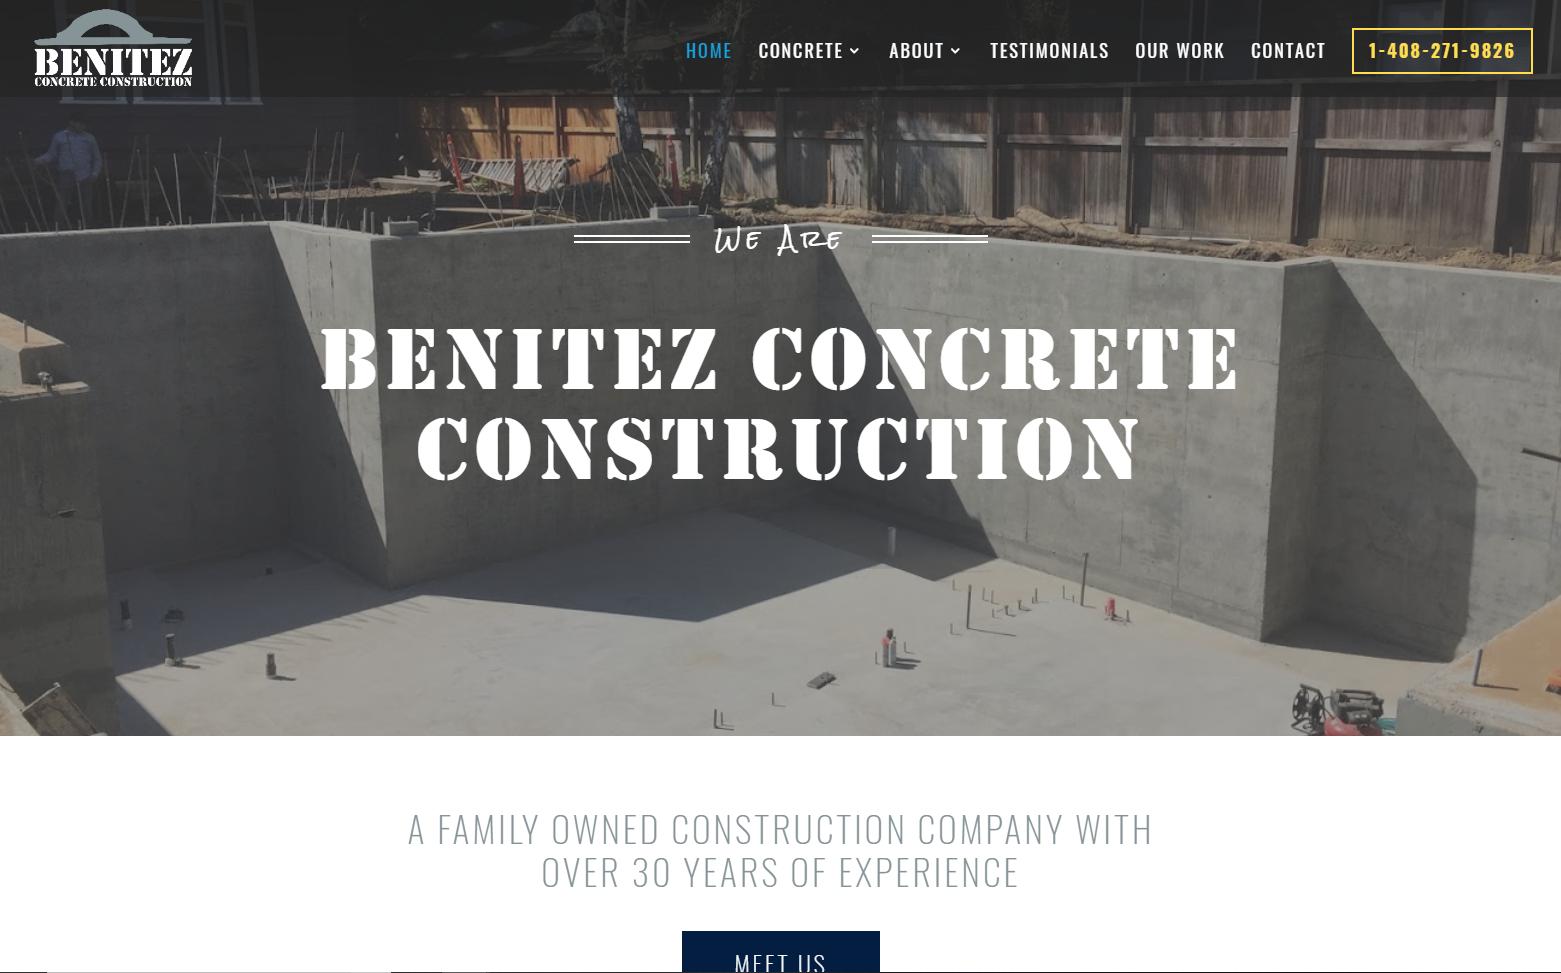 Benitez Concrete Construction - Website Redesign & Social Media marketing